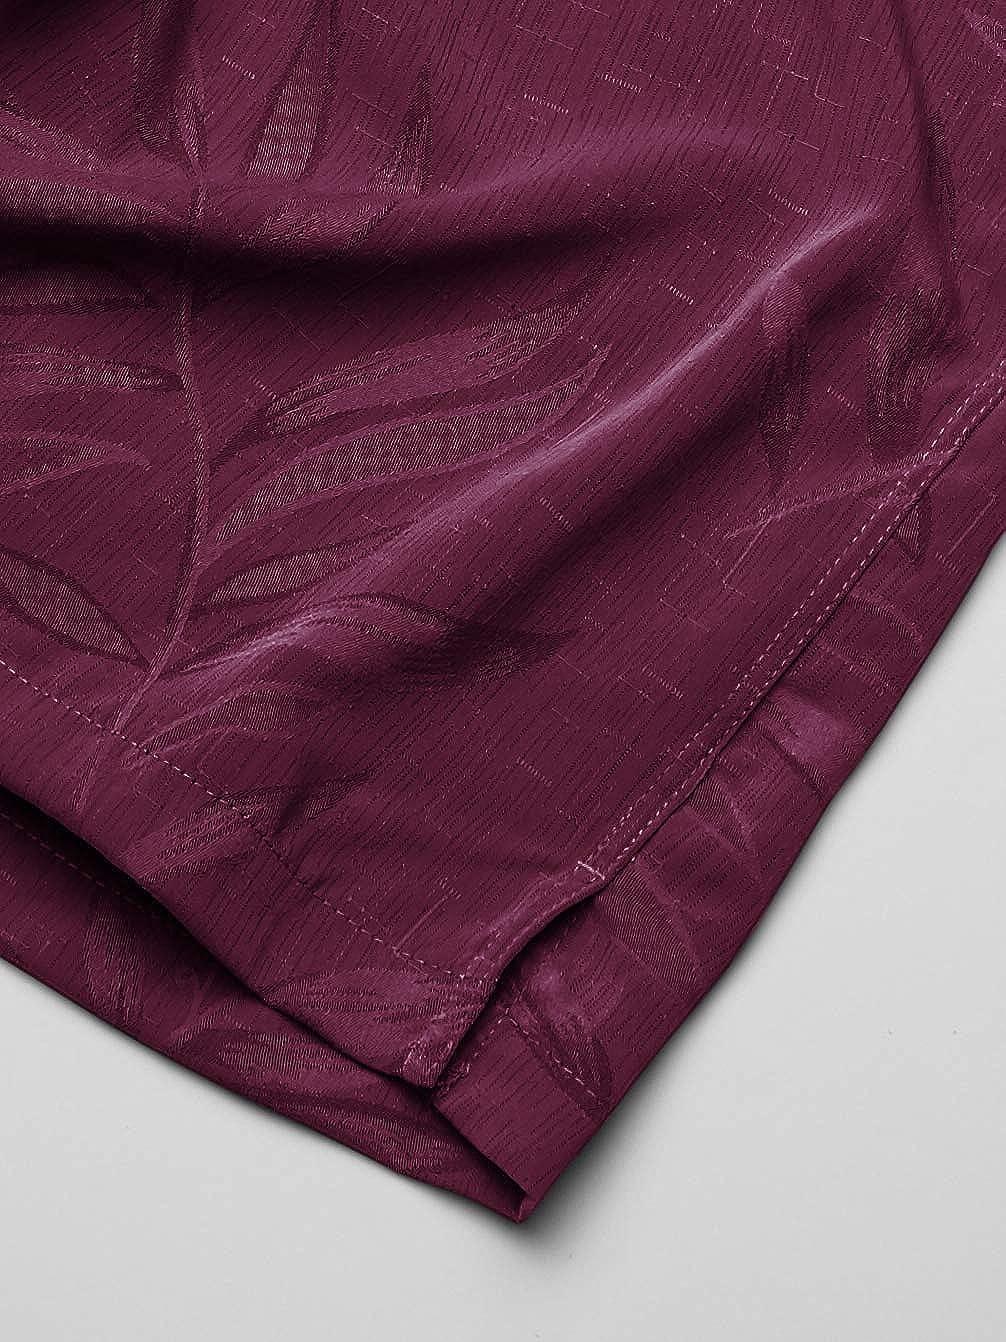 Van Heusen Mens Big and Tall Air Tropical Short Sleeve Button Down Shirt